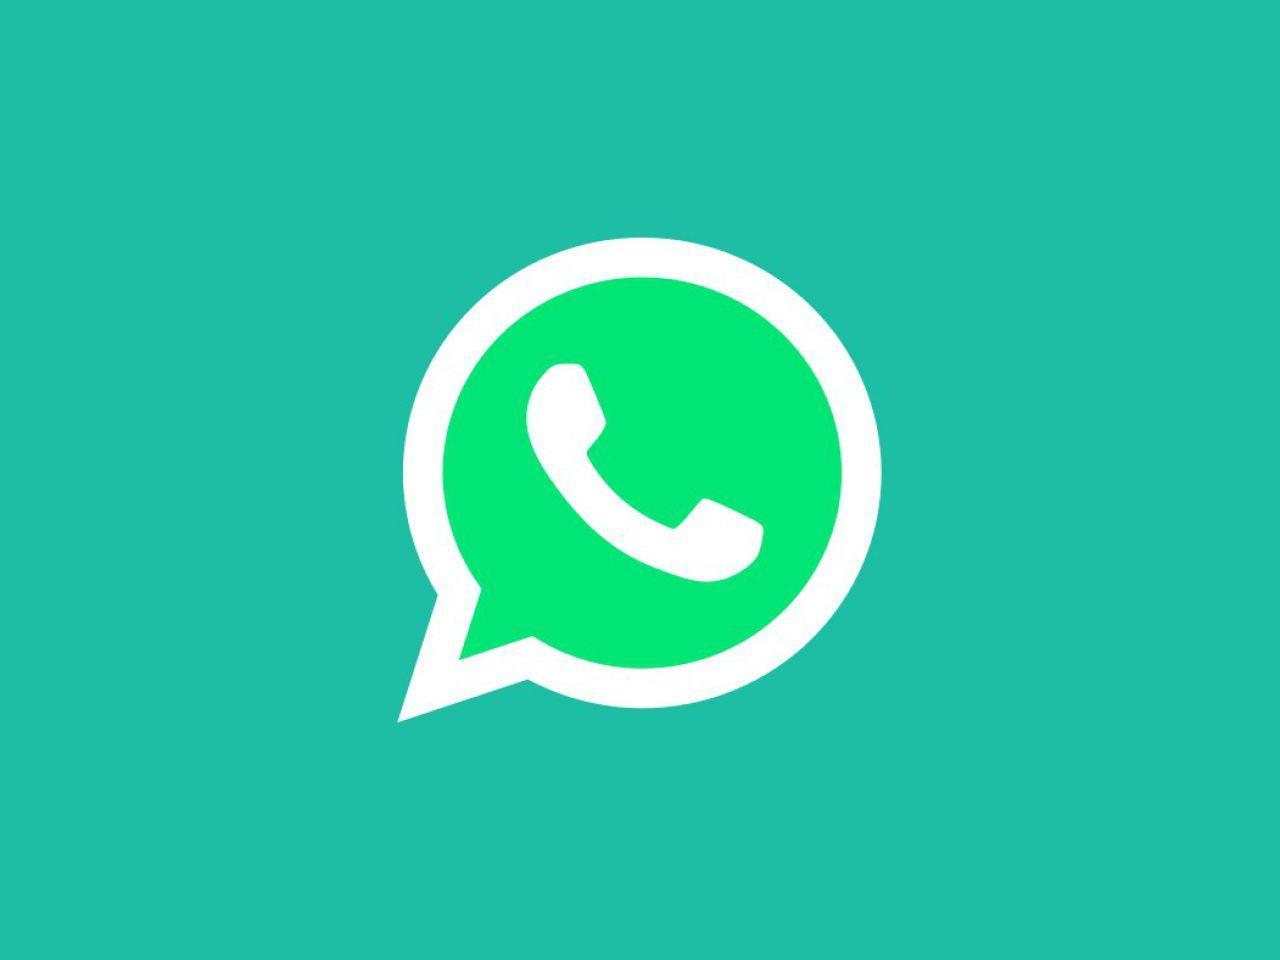 WhatsApp позволит использовать аккаунт на нескольких устройствах без смартфона (whatsapp prepara super aggiornamento novita arrivo ios android v3 451388 1280x960 1)